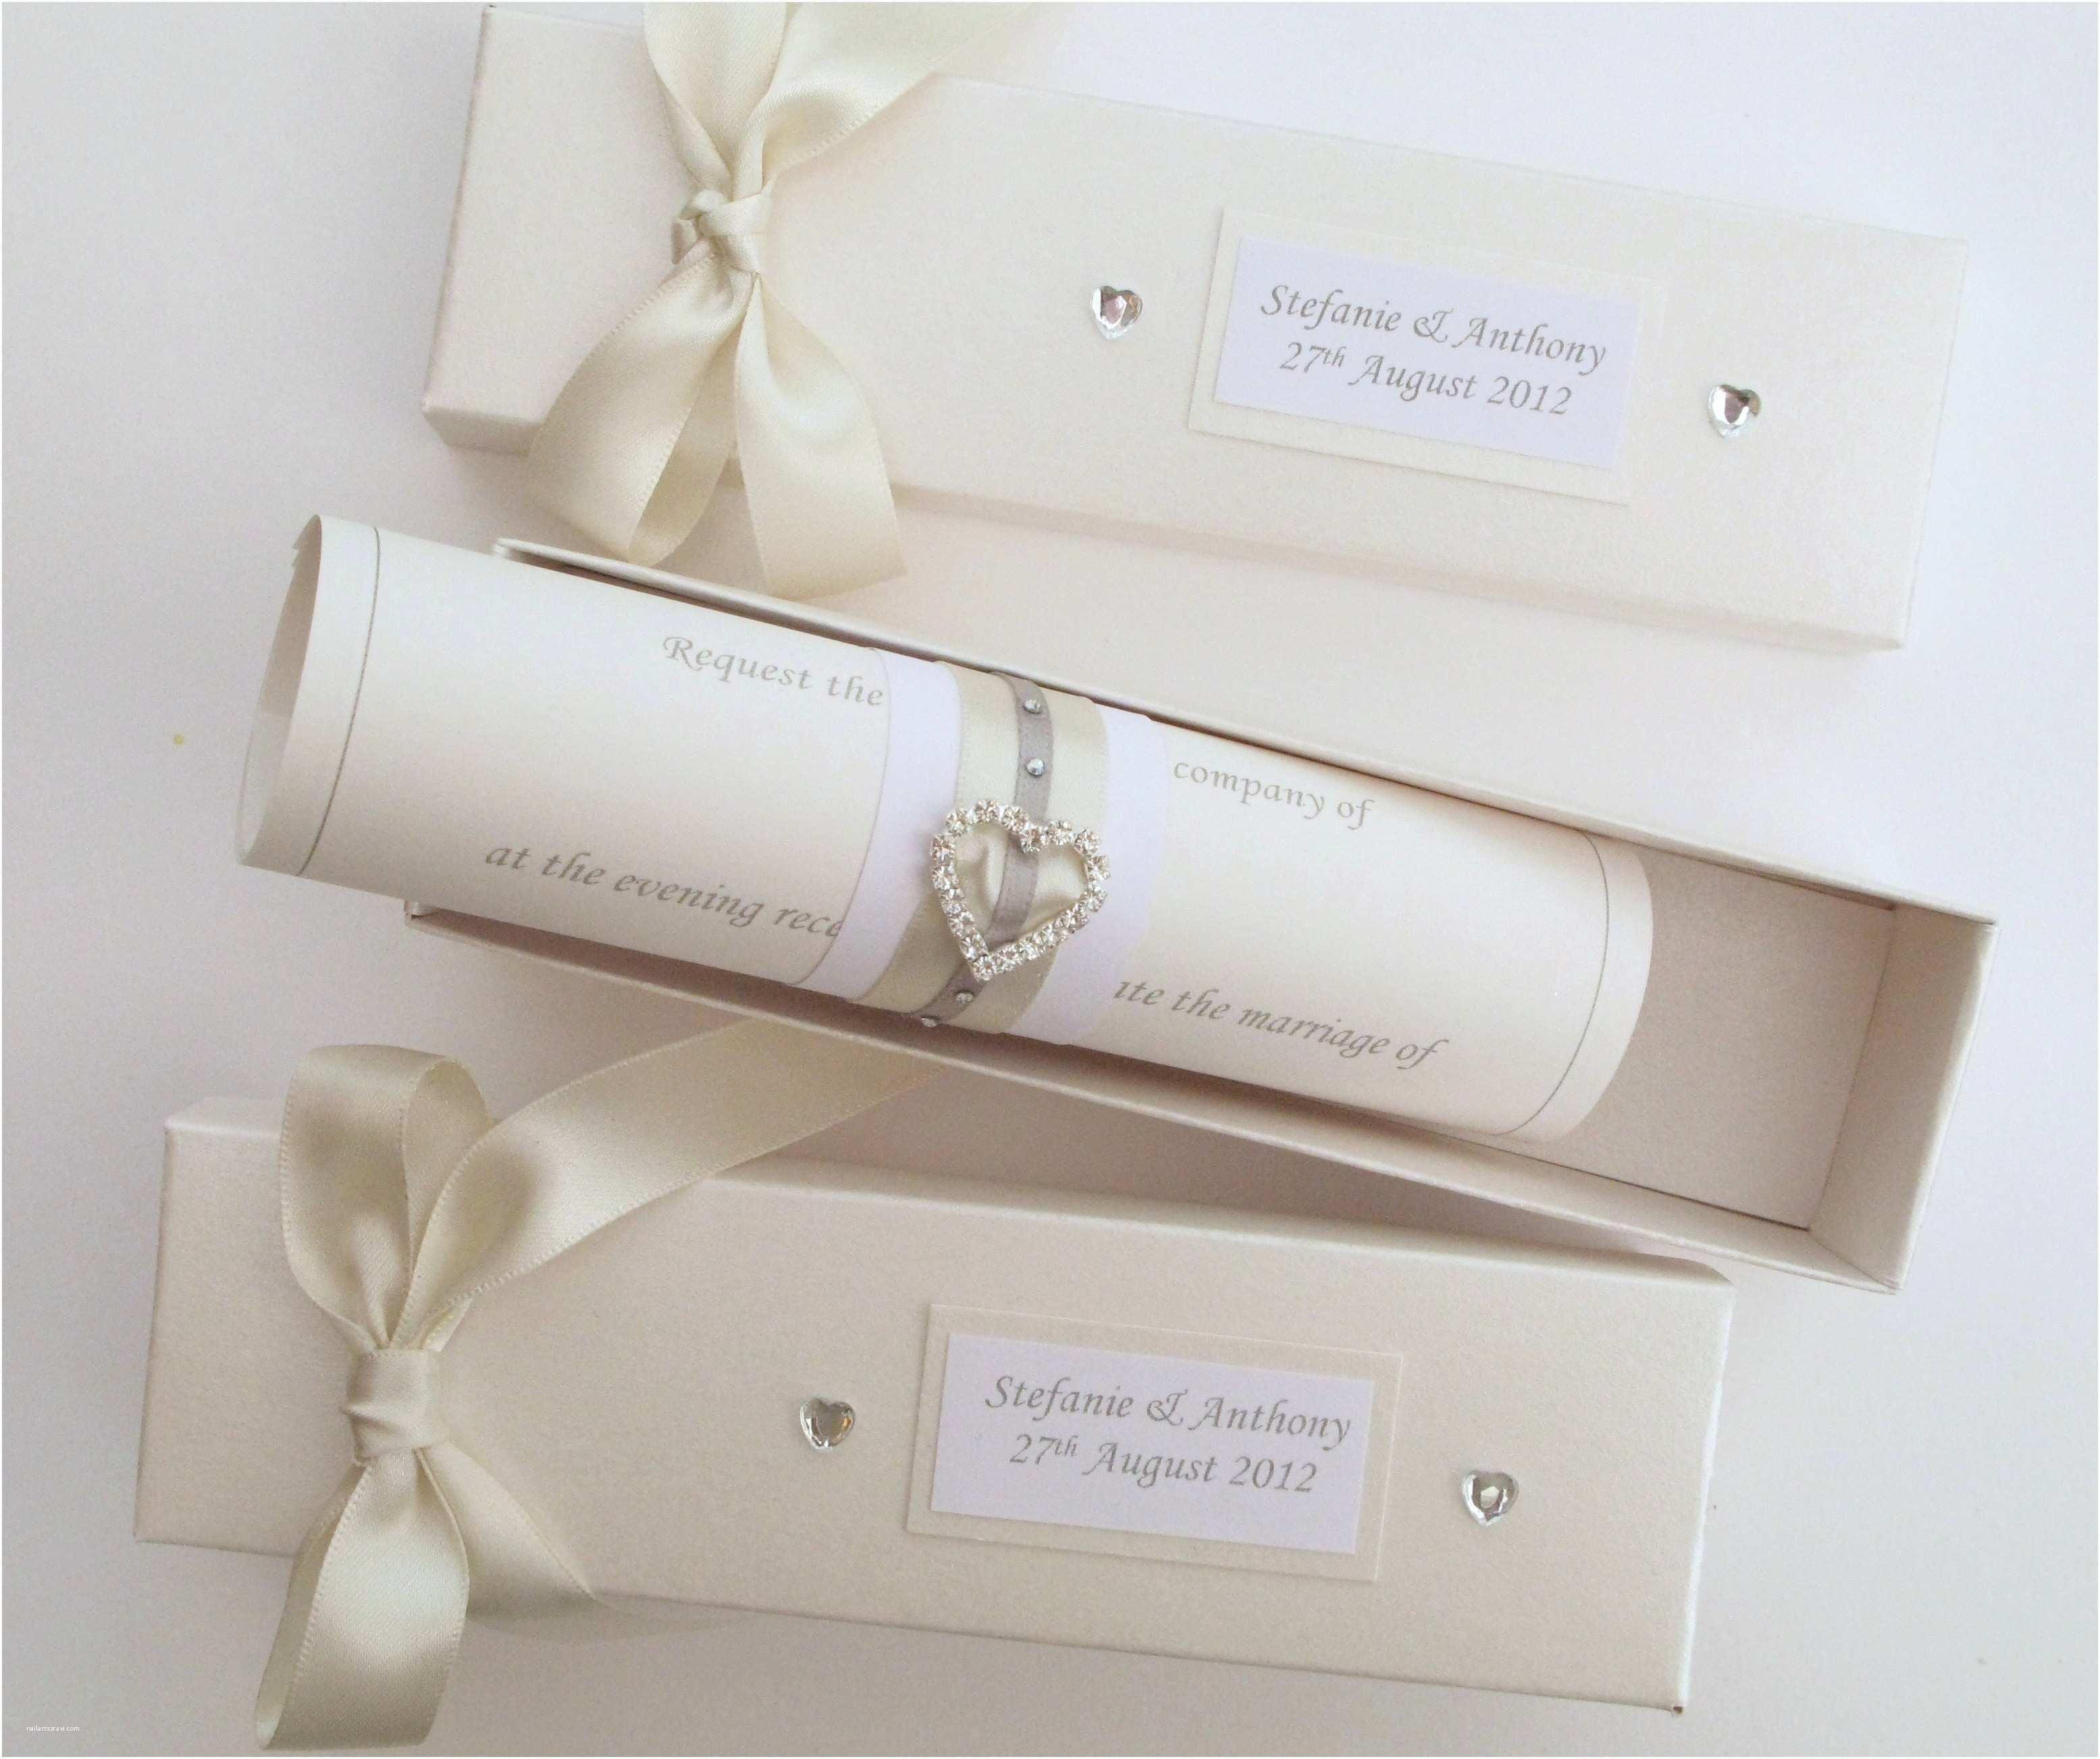 New Wedding Invitations 3 Wedding Invitation Tips to Follow Arabia Weddings